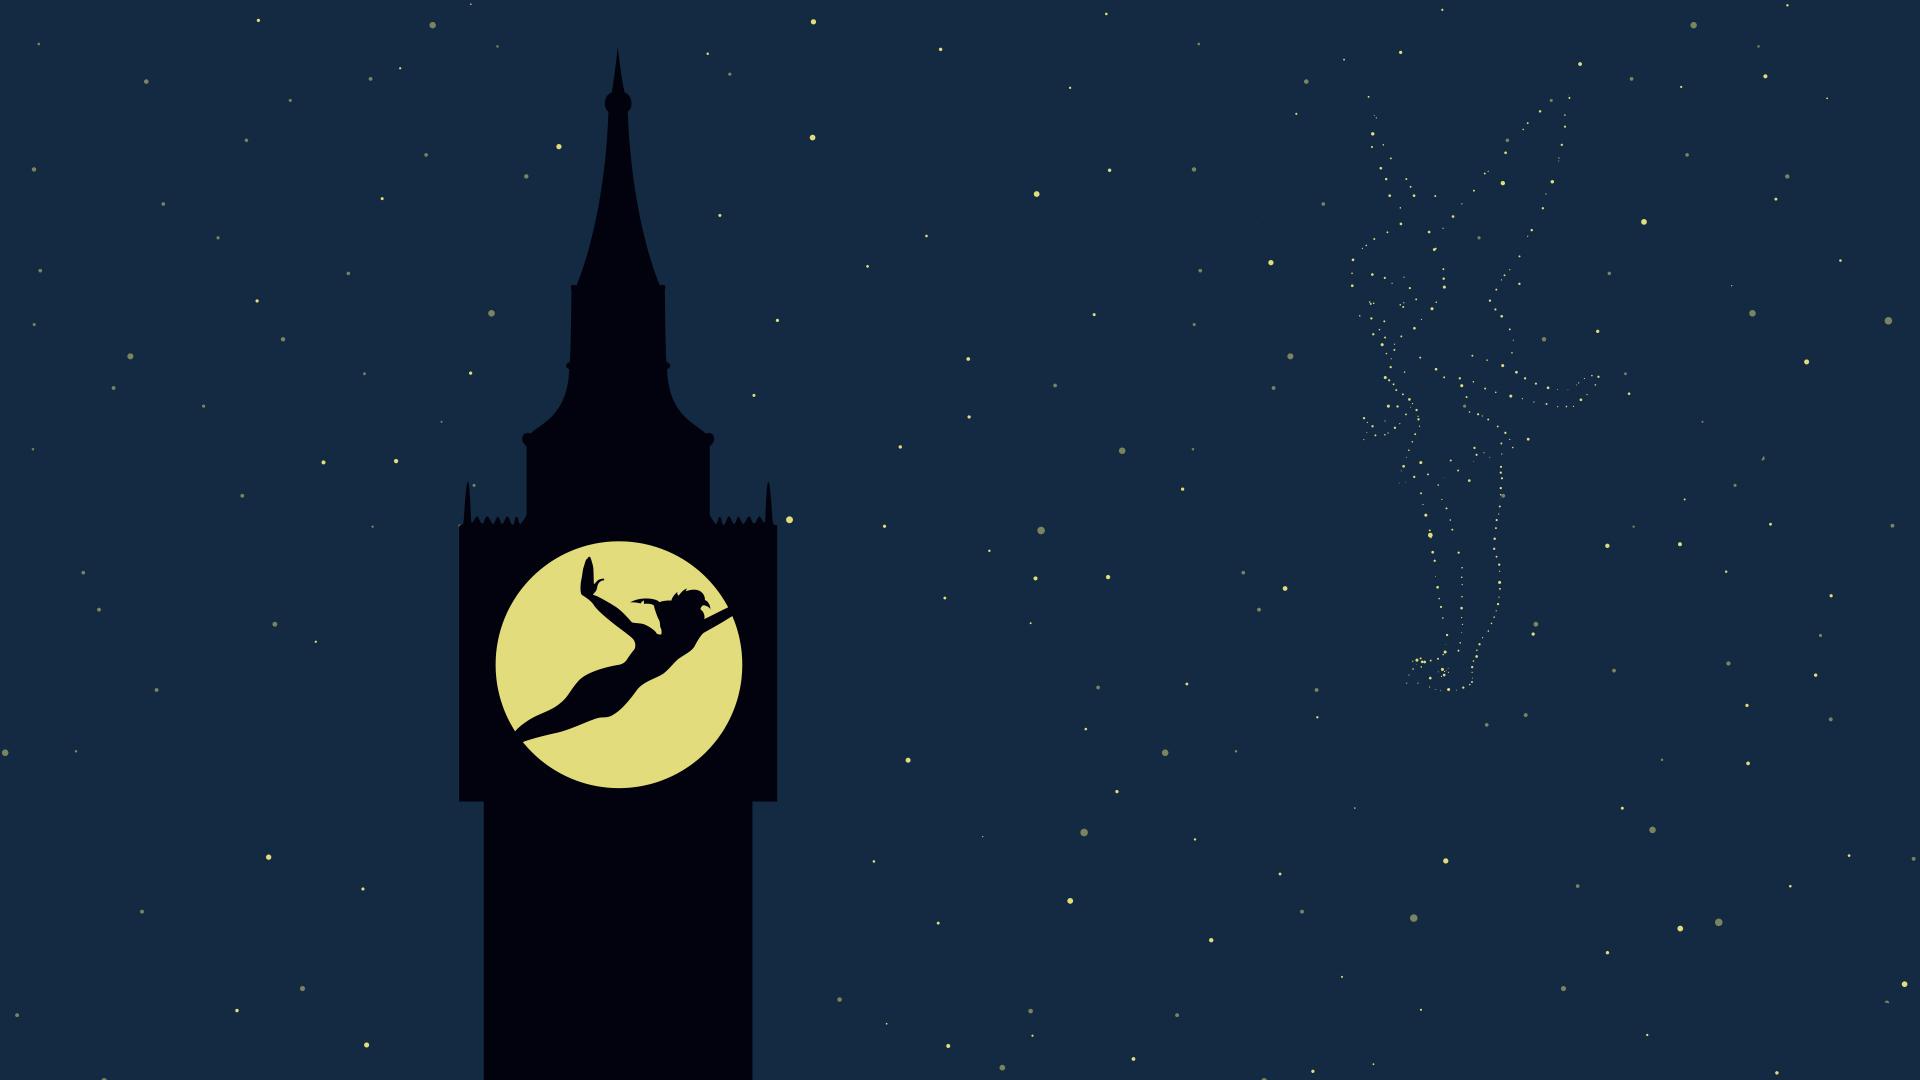 London Iphone X Wallpaper Peter Pan Night Stars Tinkerbell Disney Hd Wallpaper